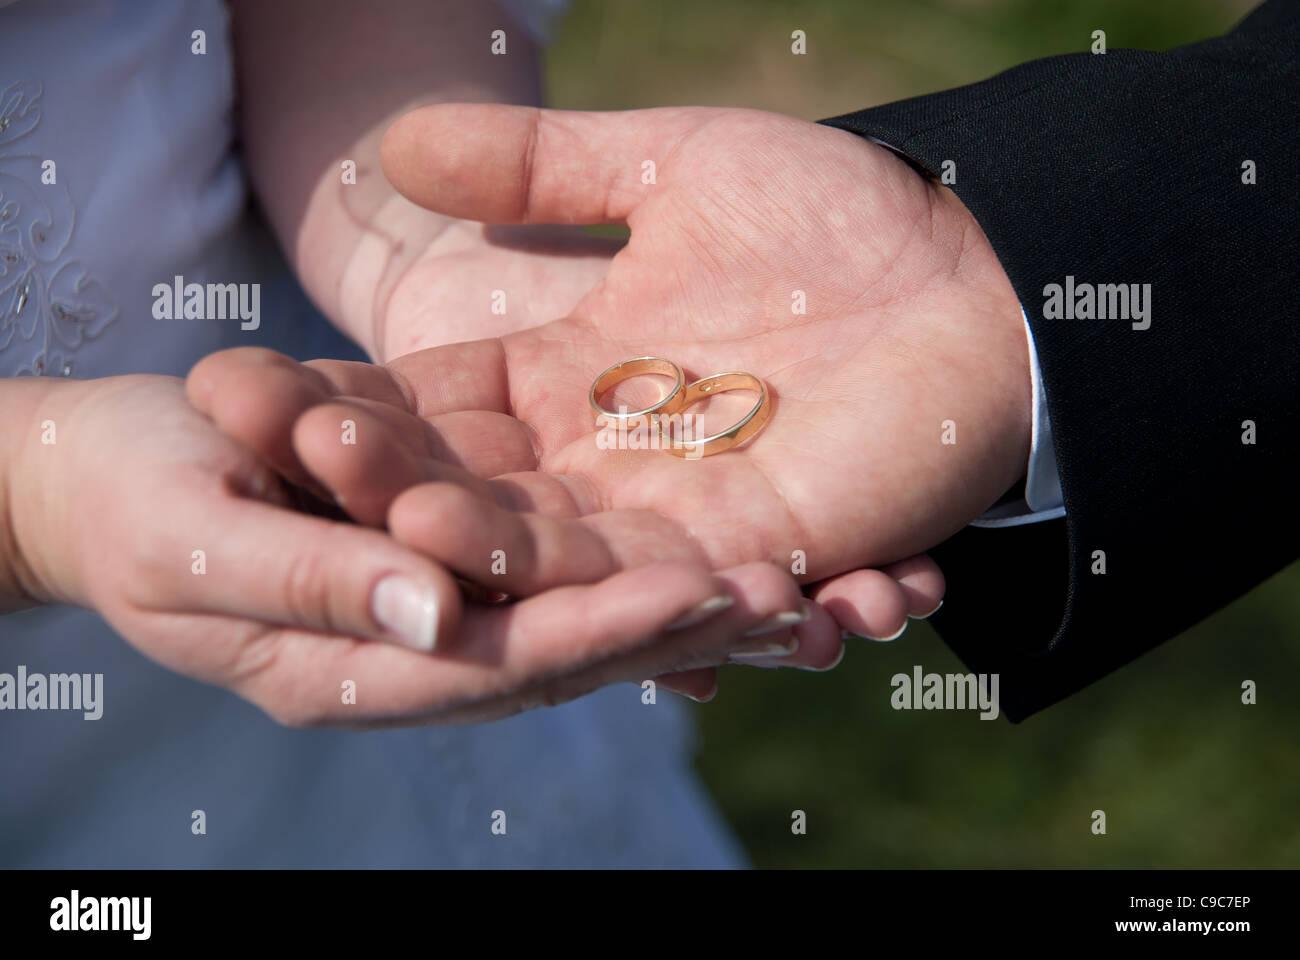 Bands Wedding Stock Photos & Bands Wedding Stock Images - Alamy